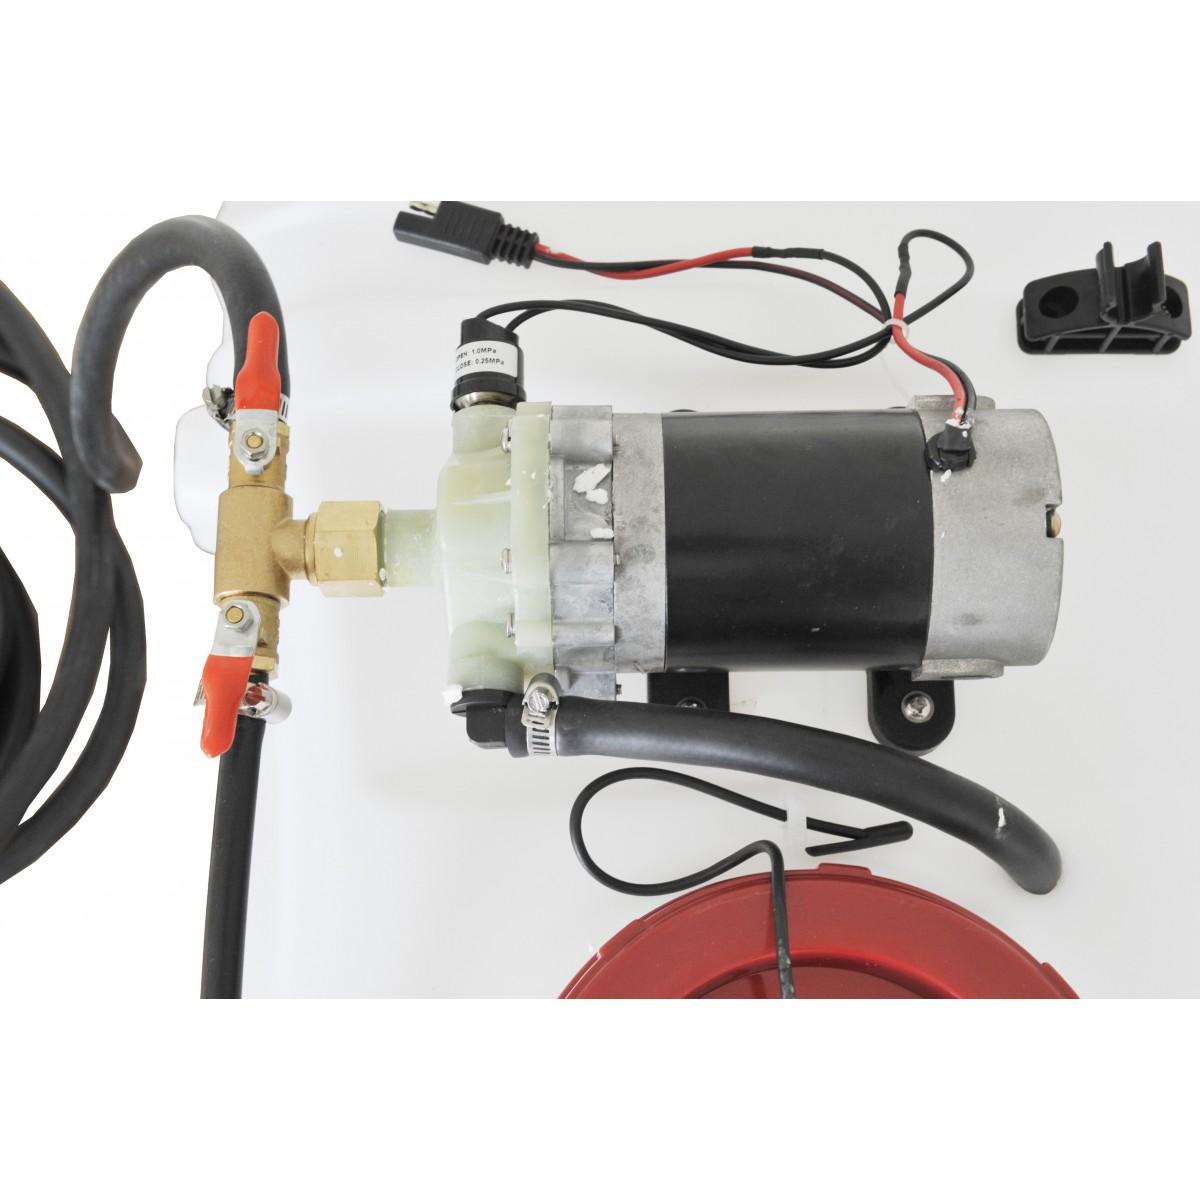 Electric pressure sprayer 12V 60L SX-CZ60C